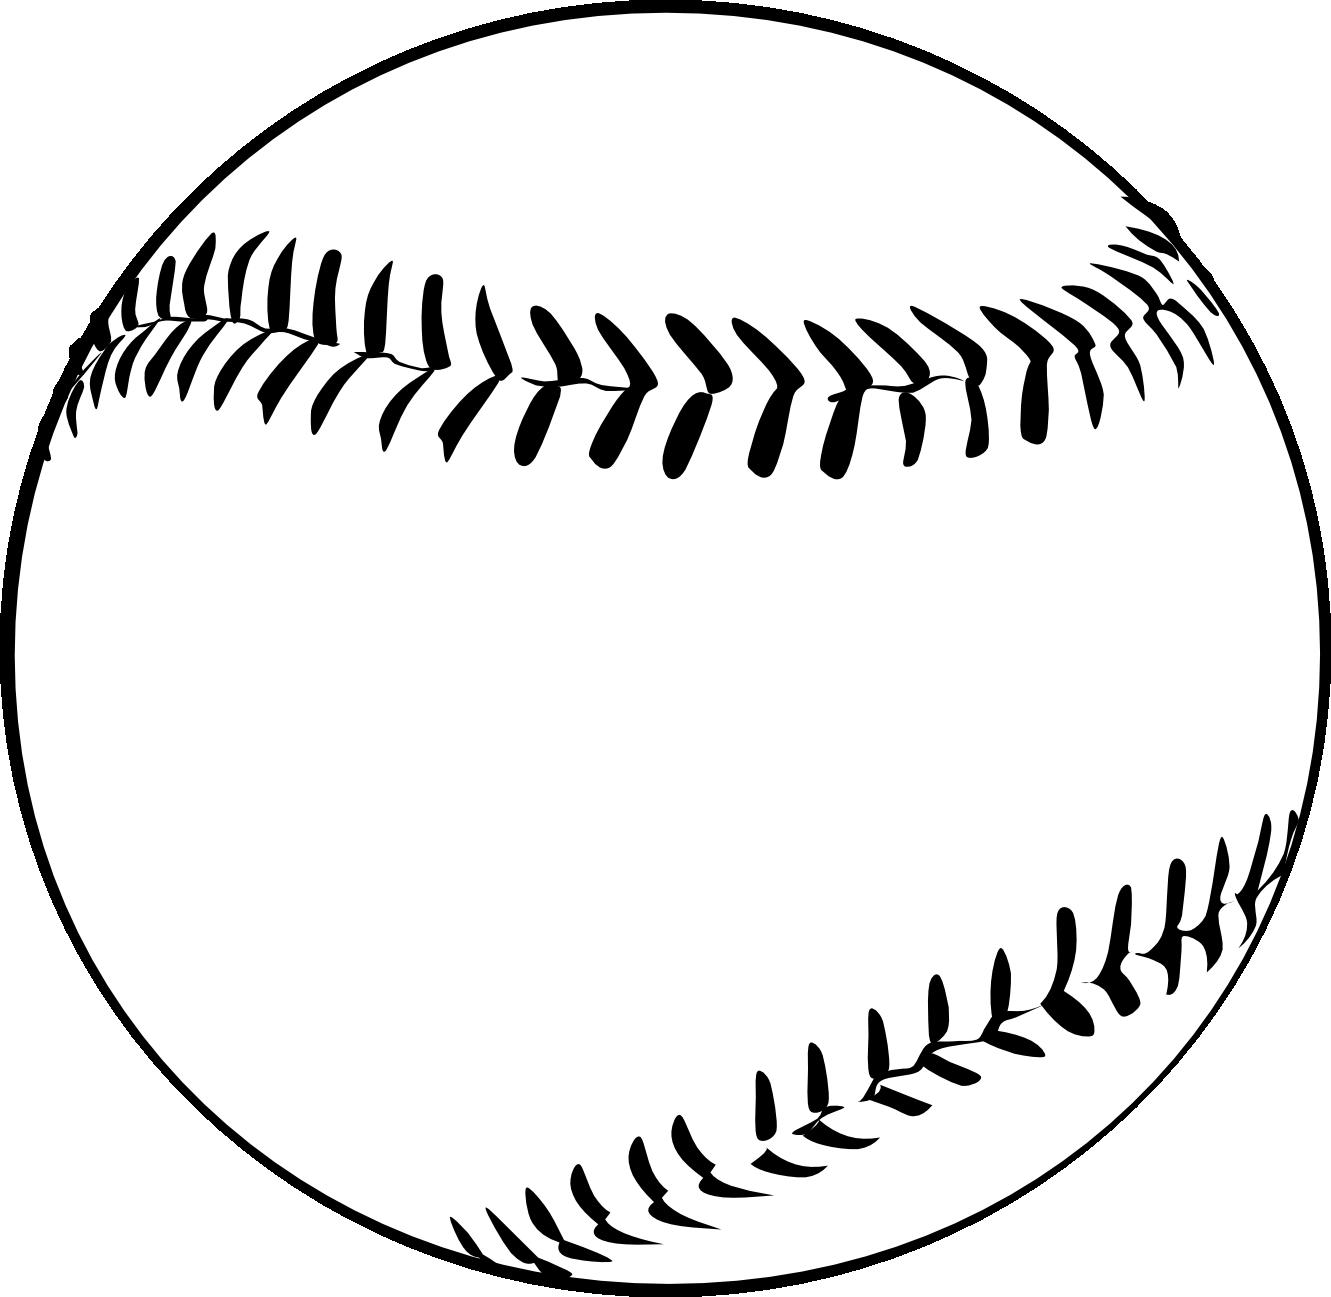 Free baseball clip art images free clipa-Free baseball clip art images free clipart 3-10